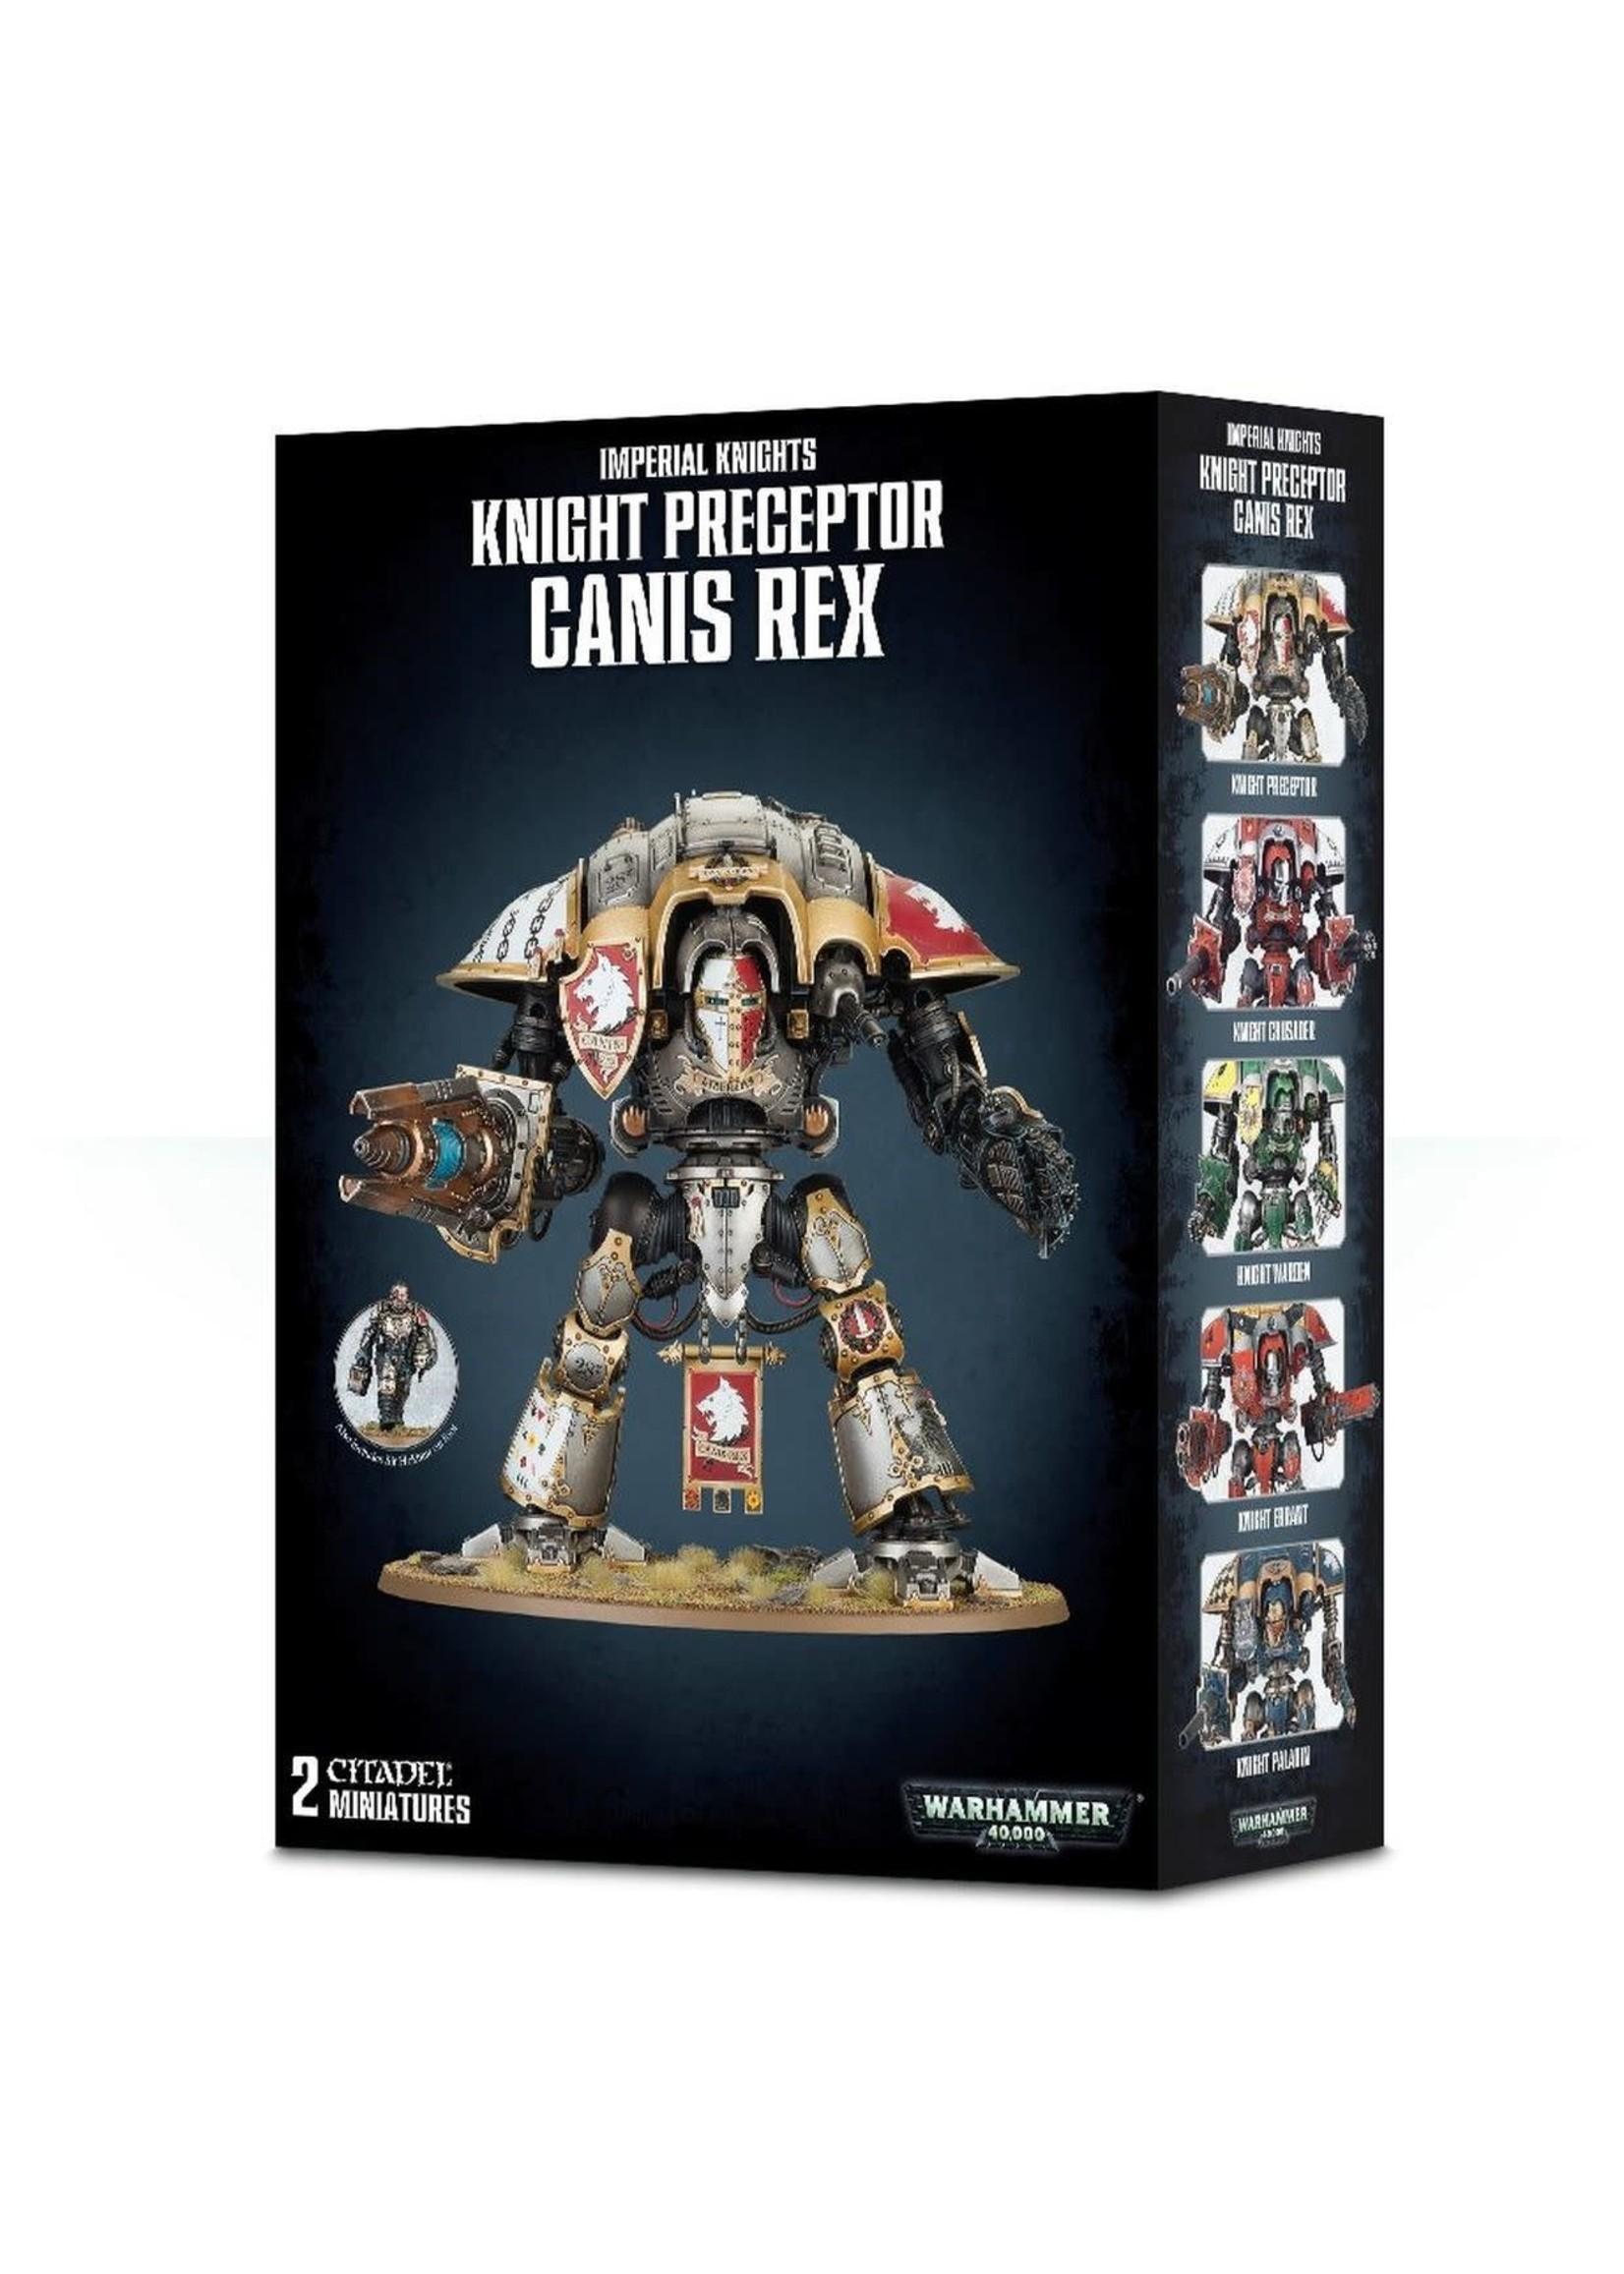 Warhammer: 40K Knight Preceptor Canis Rex